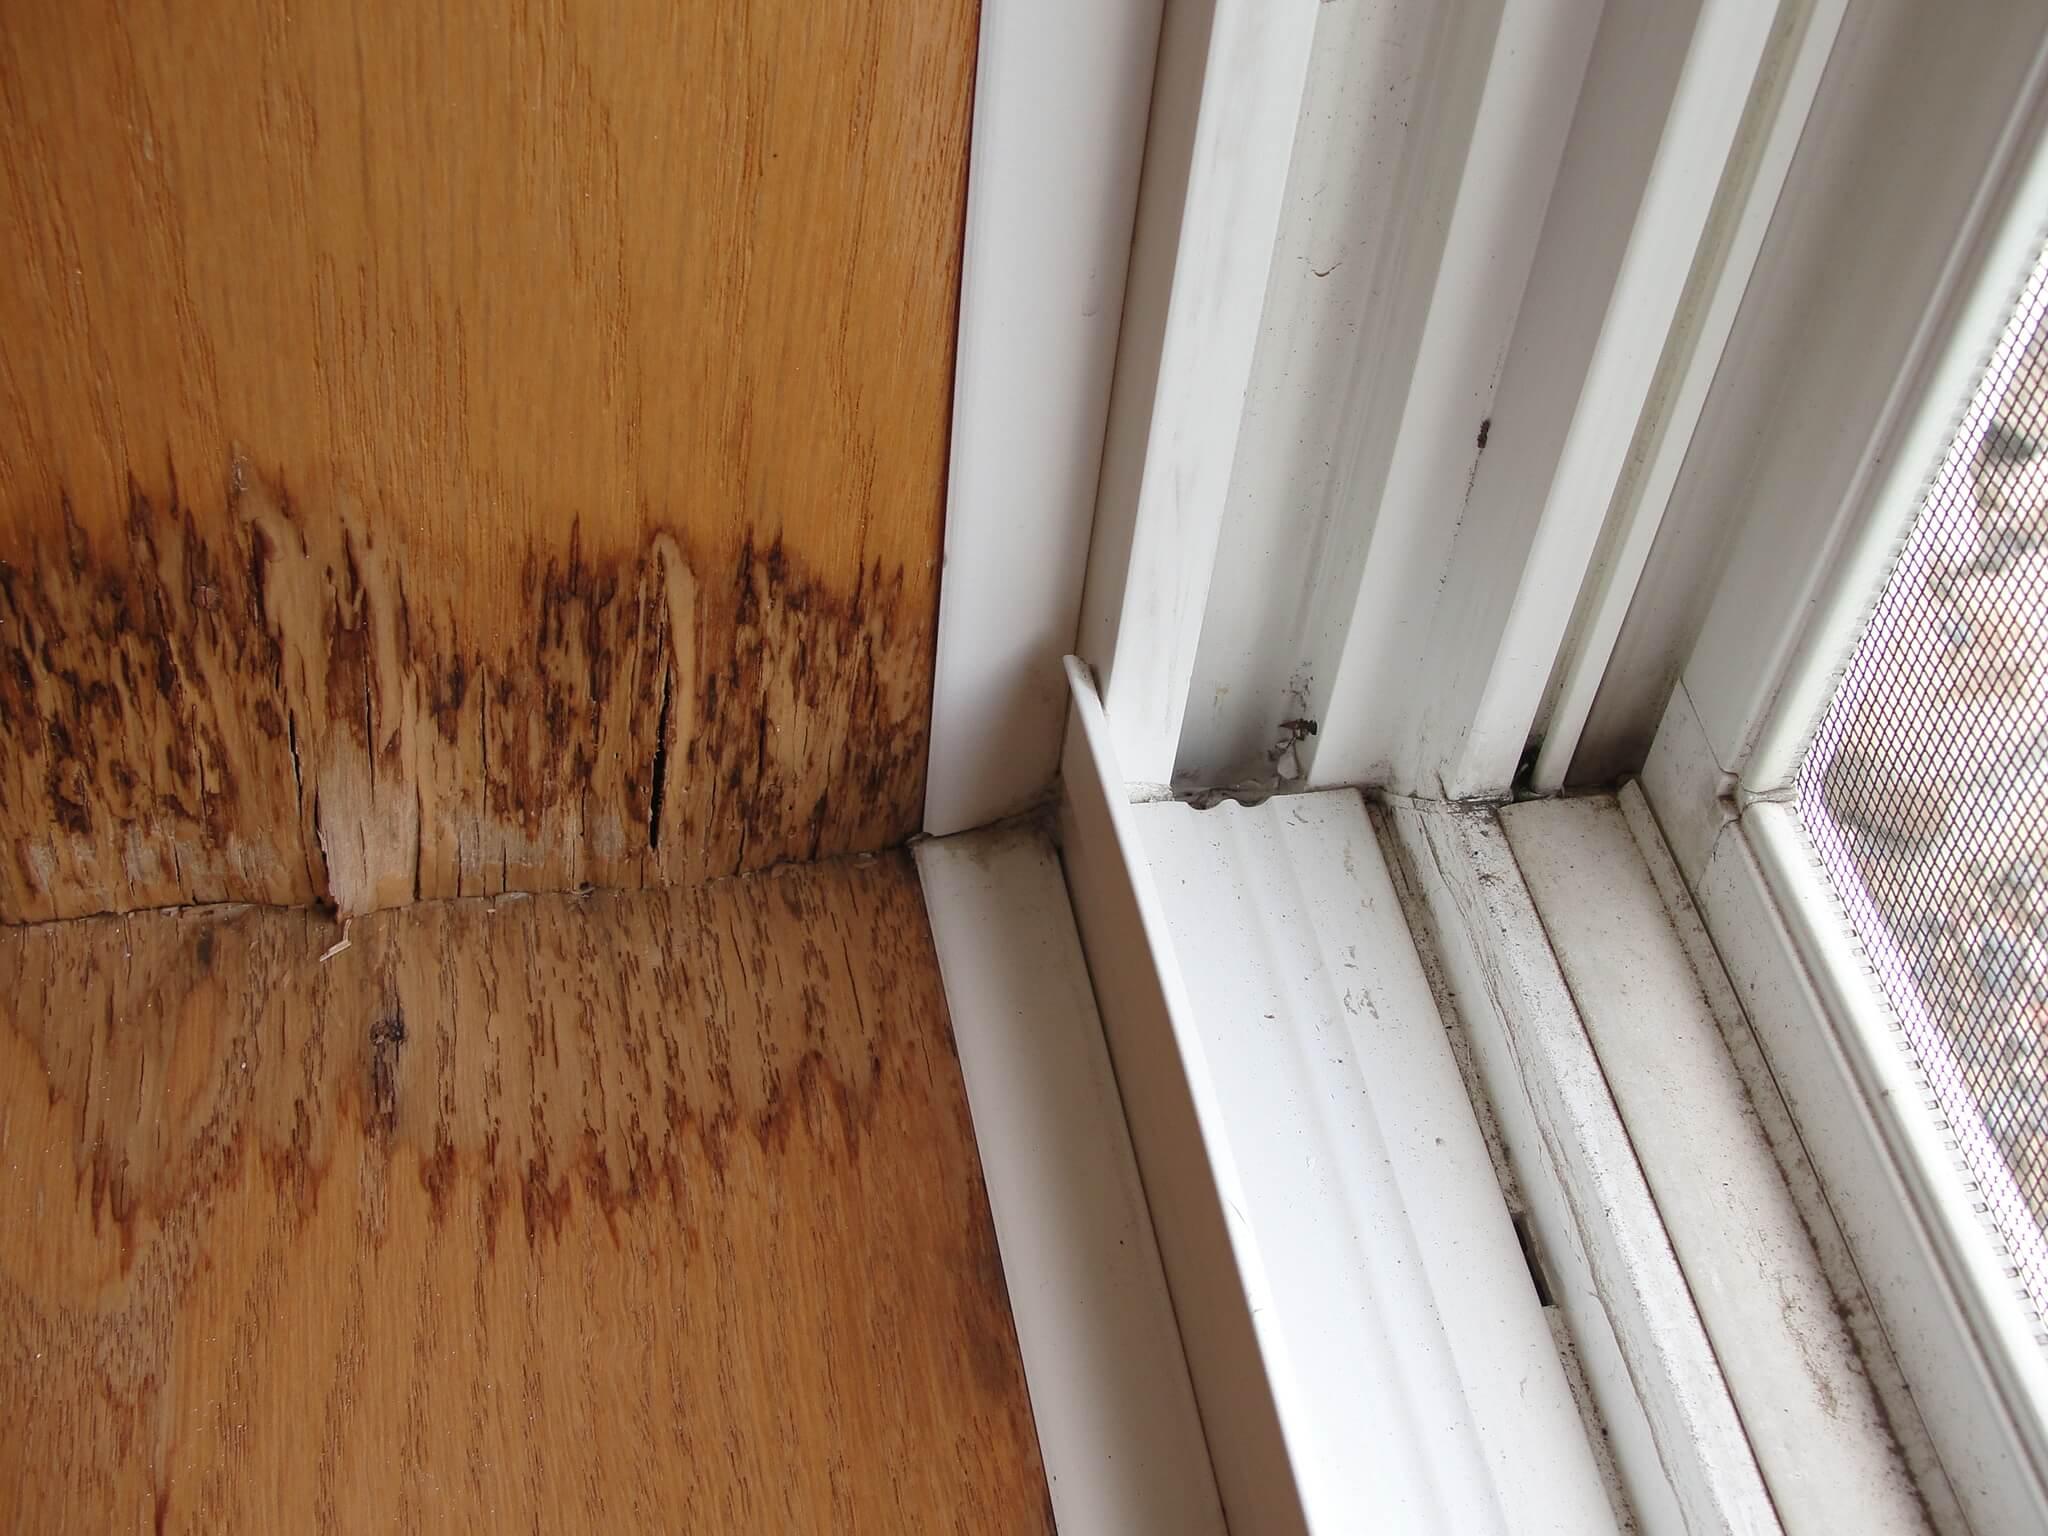 window stain